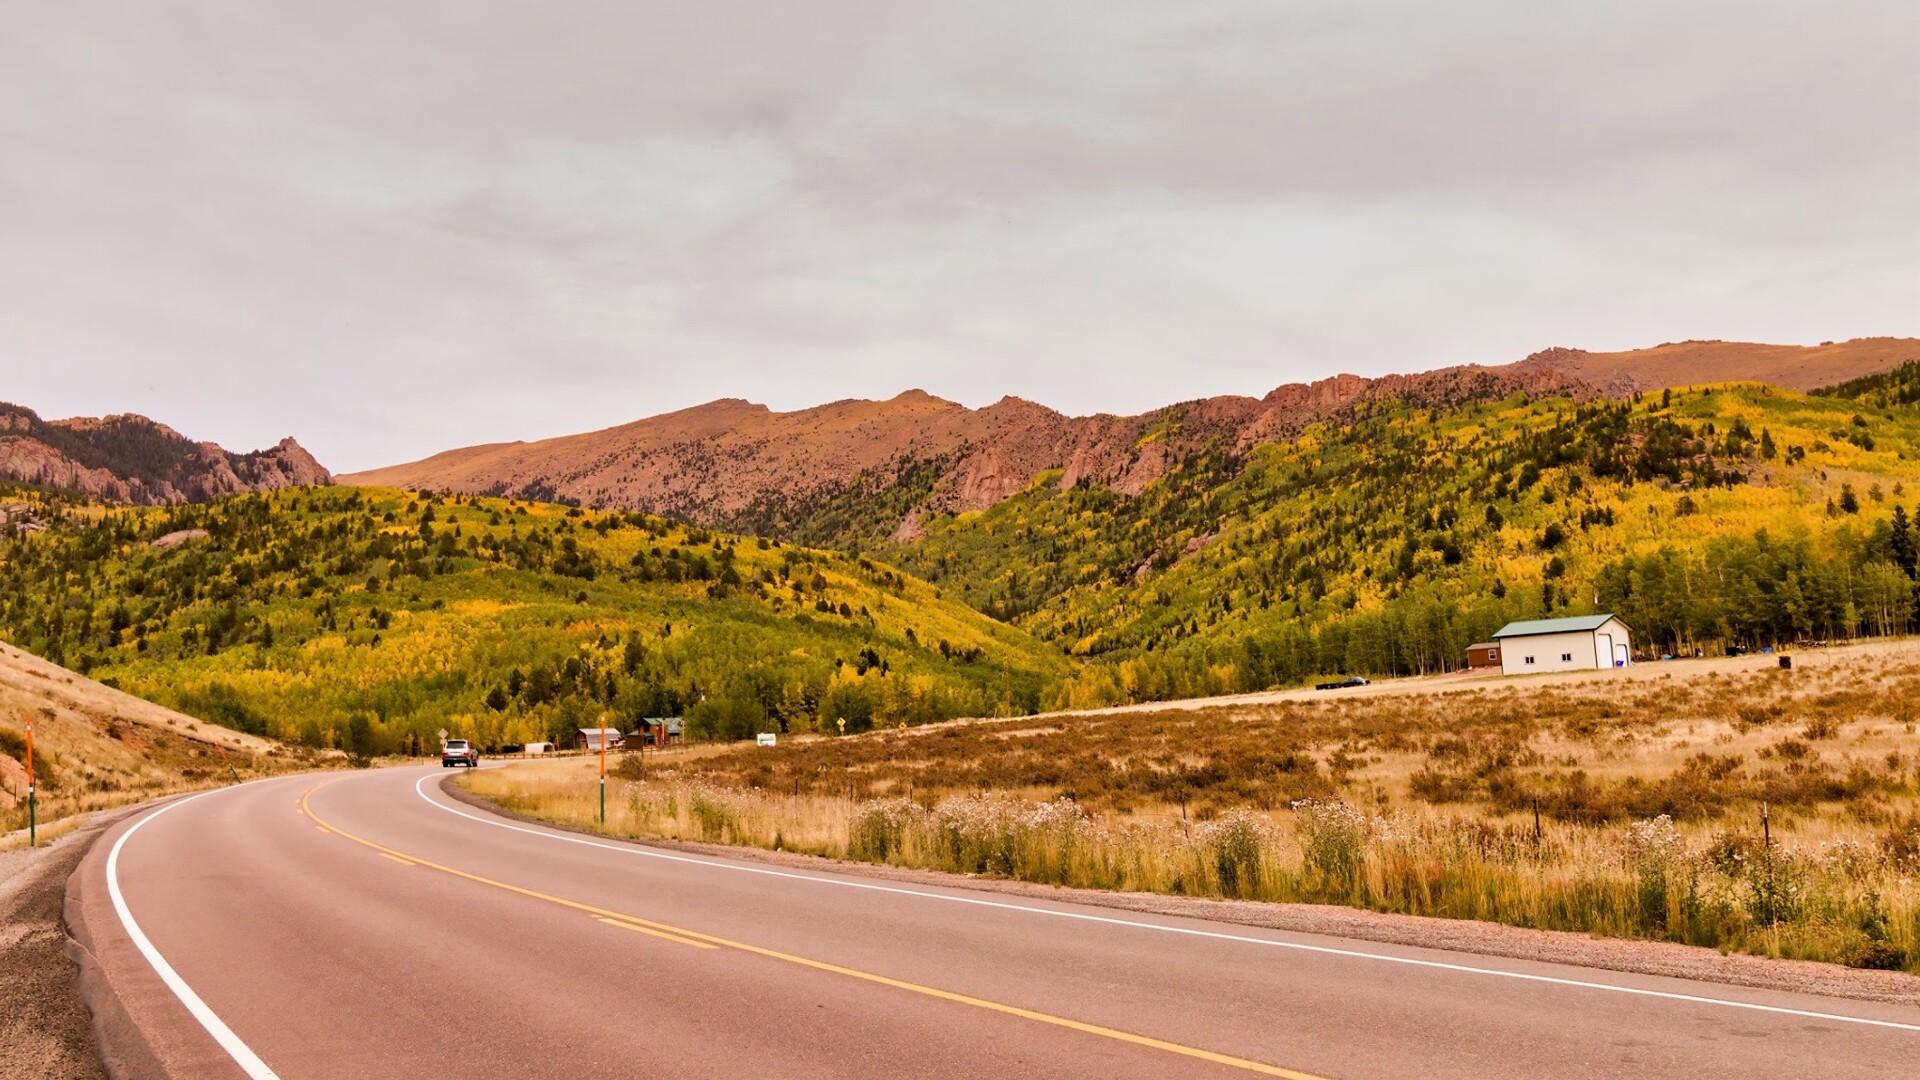 Highway 67 Larry Marr.jpg